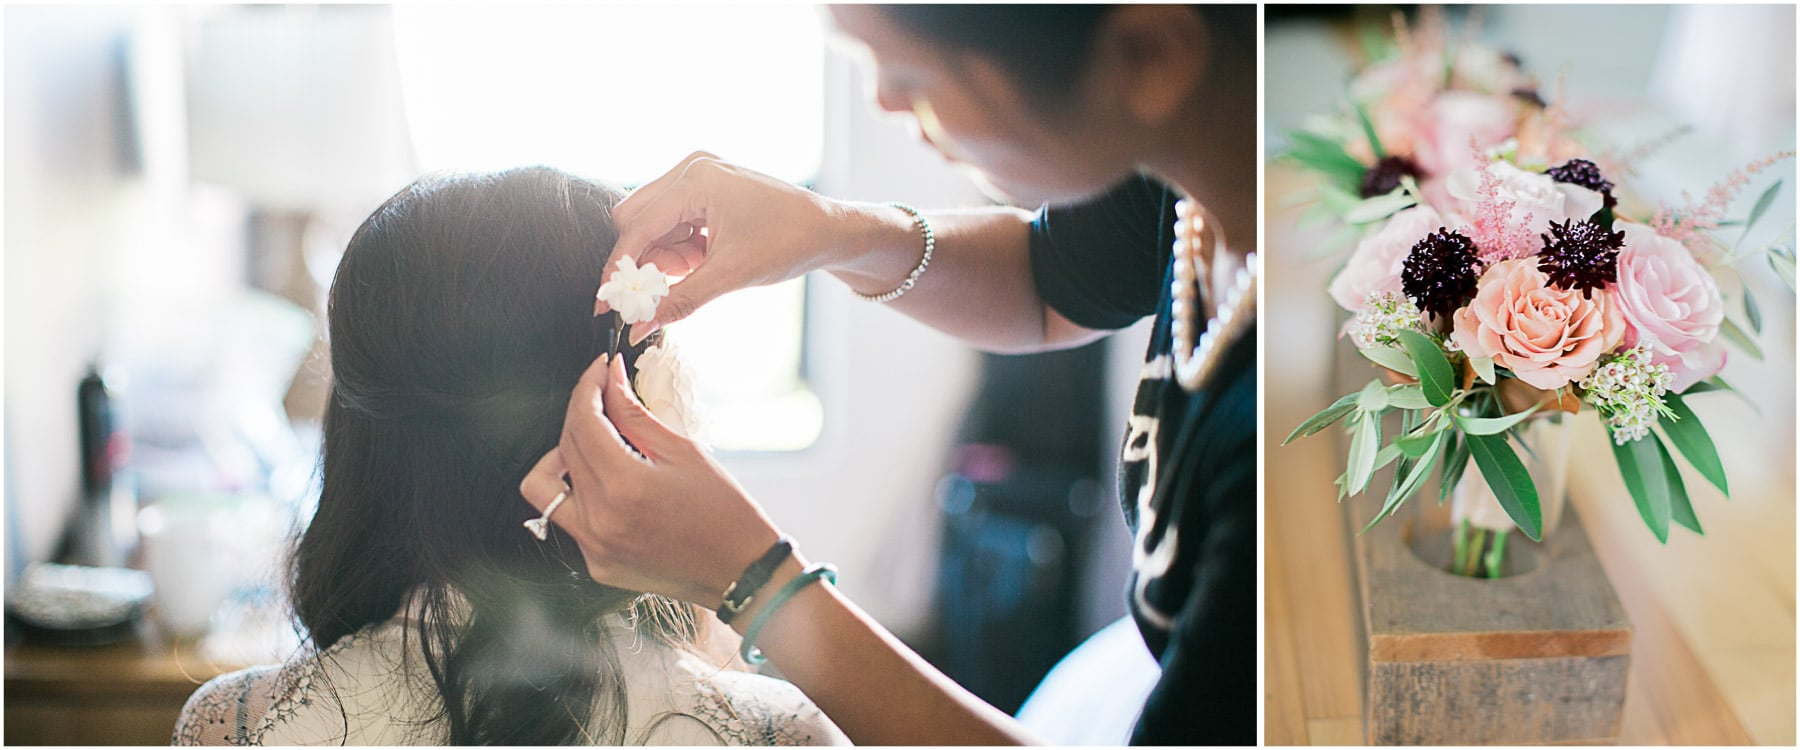 JennaBethPhotography-SHWedding-1.jpg